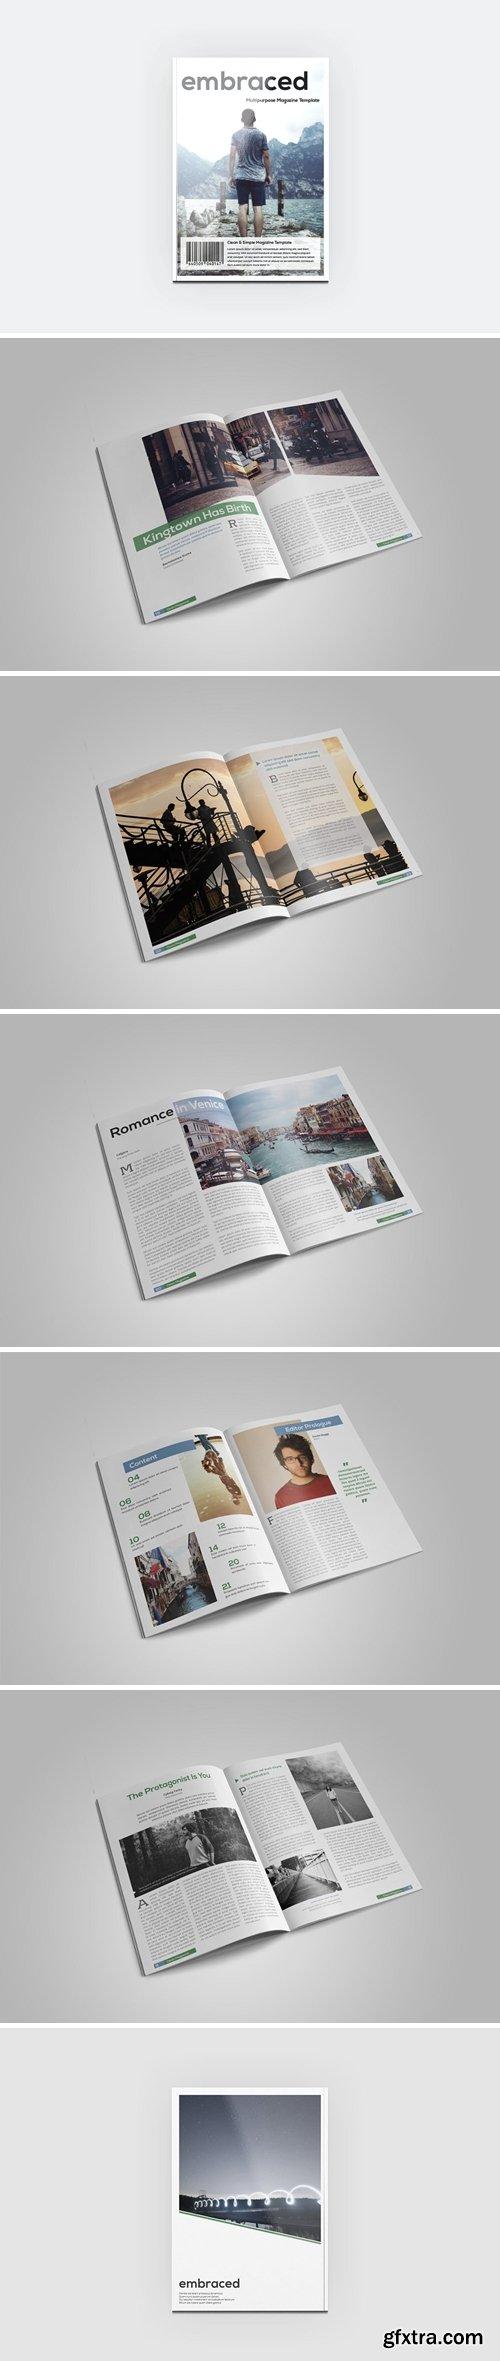 HQ - Embraced Magazine V10